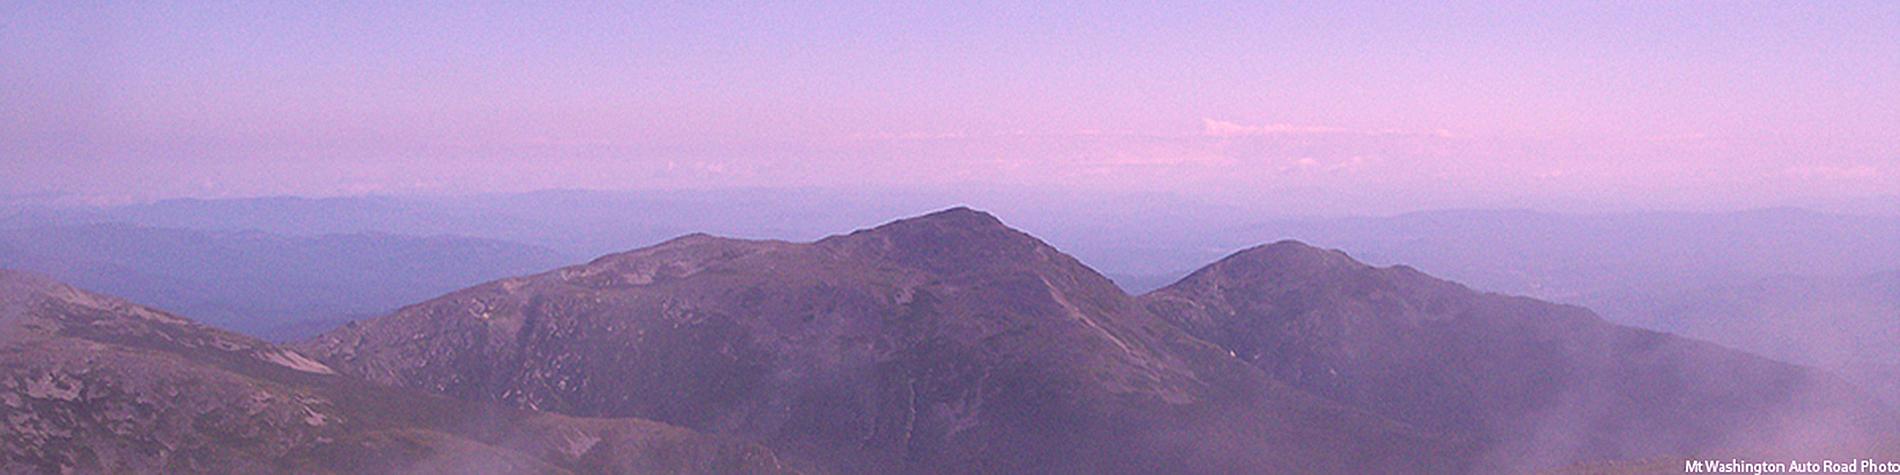 Mt Washington Auto Road Sunrise